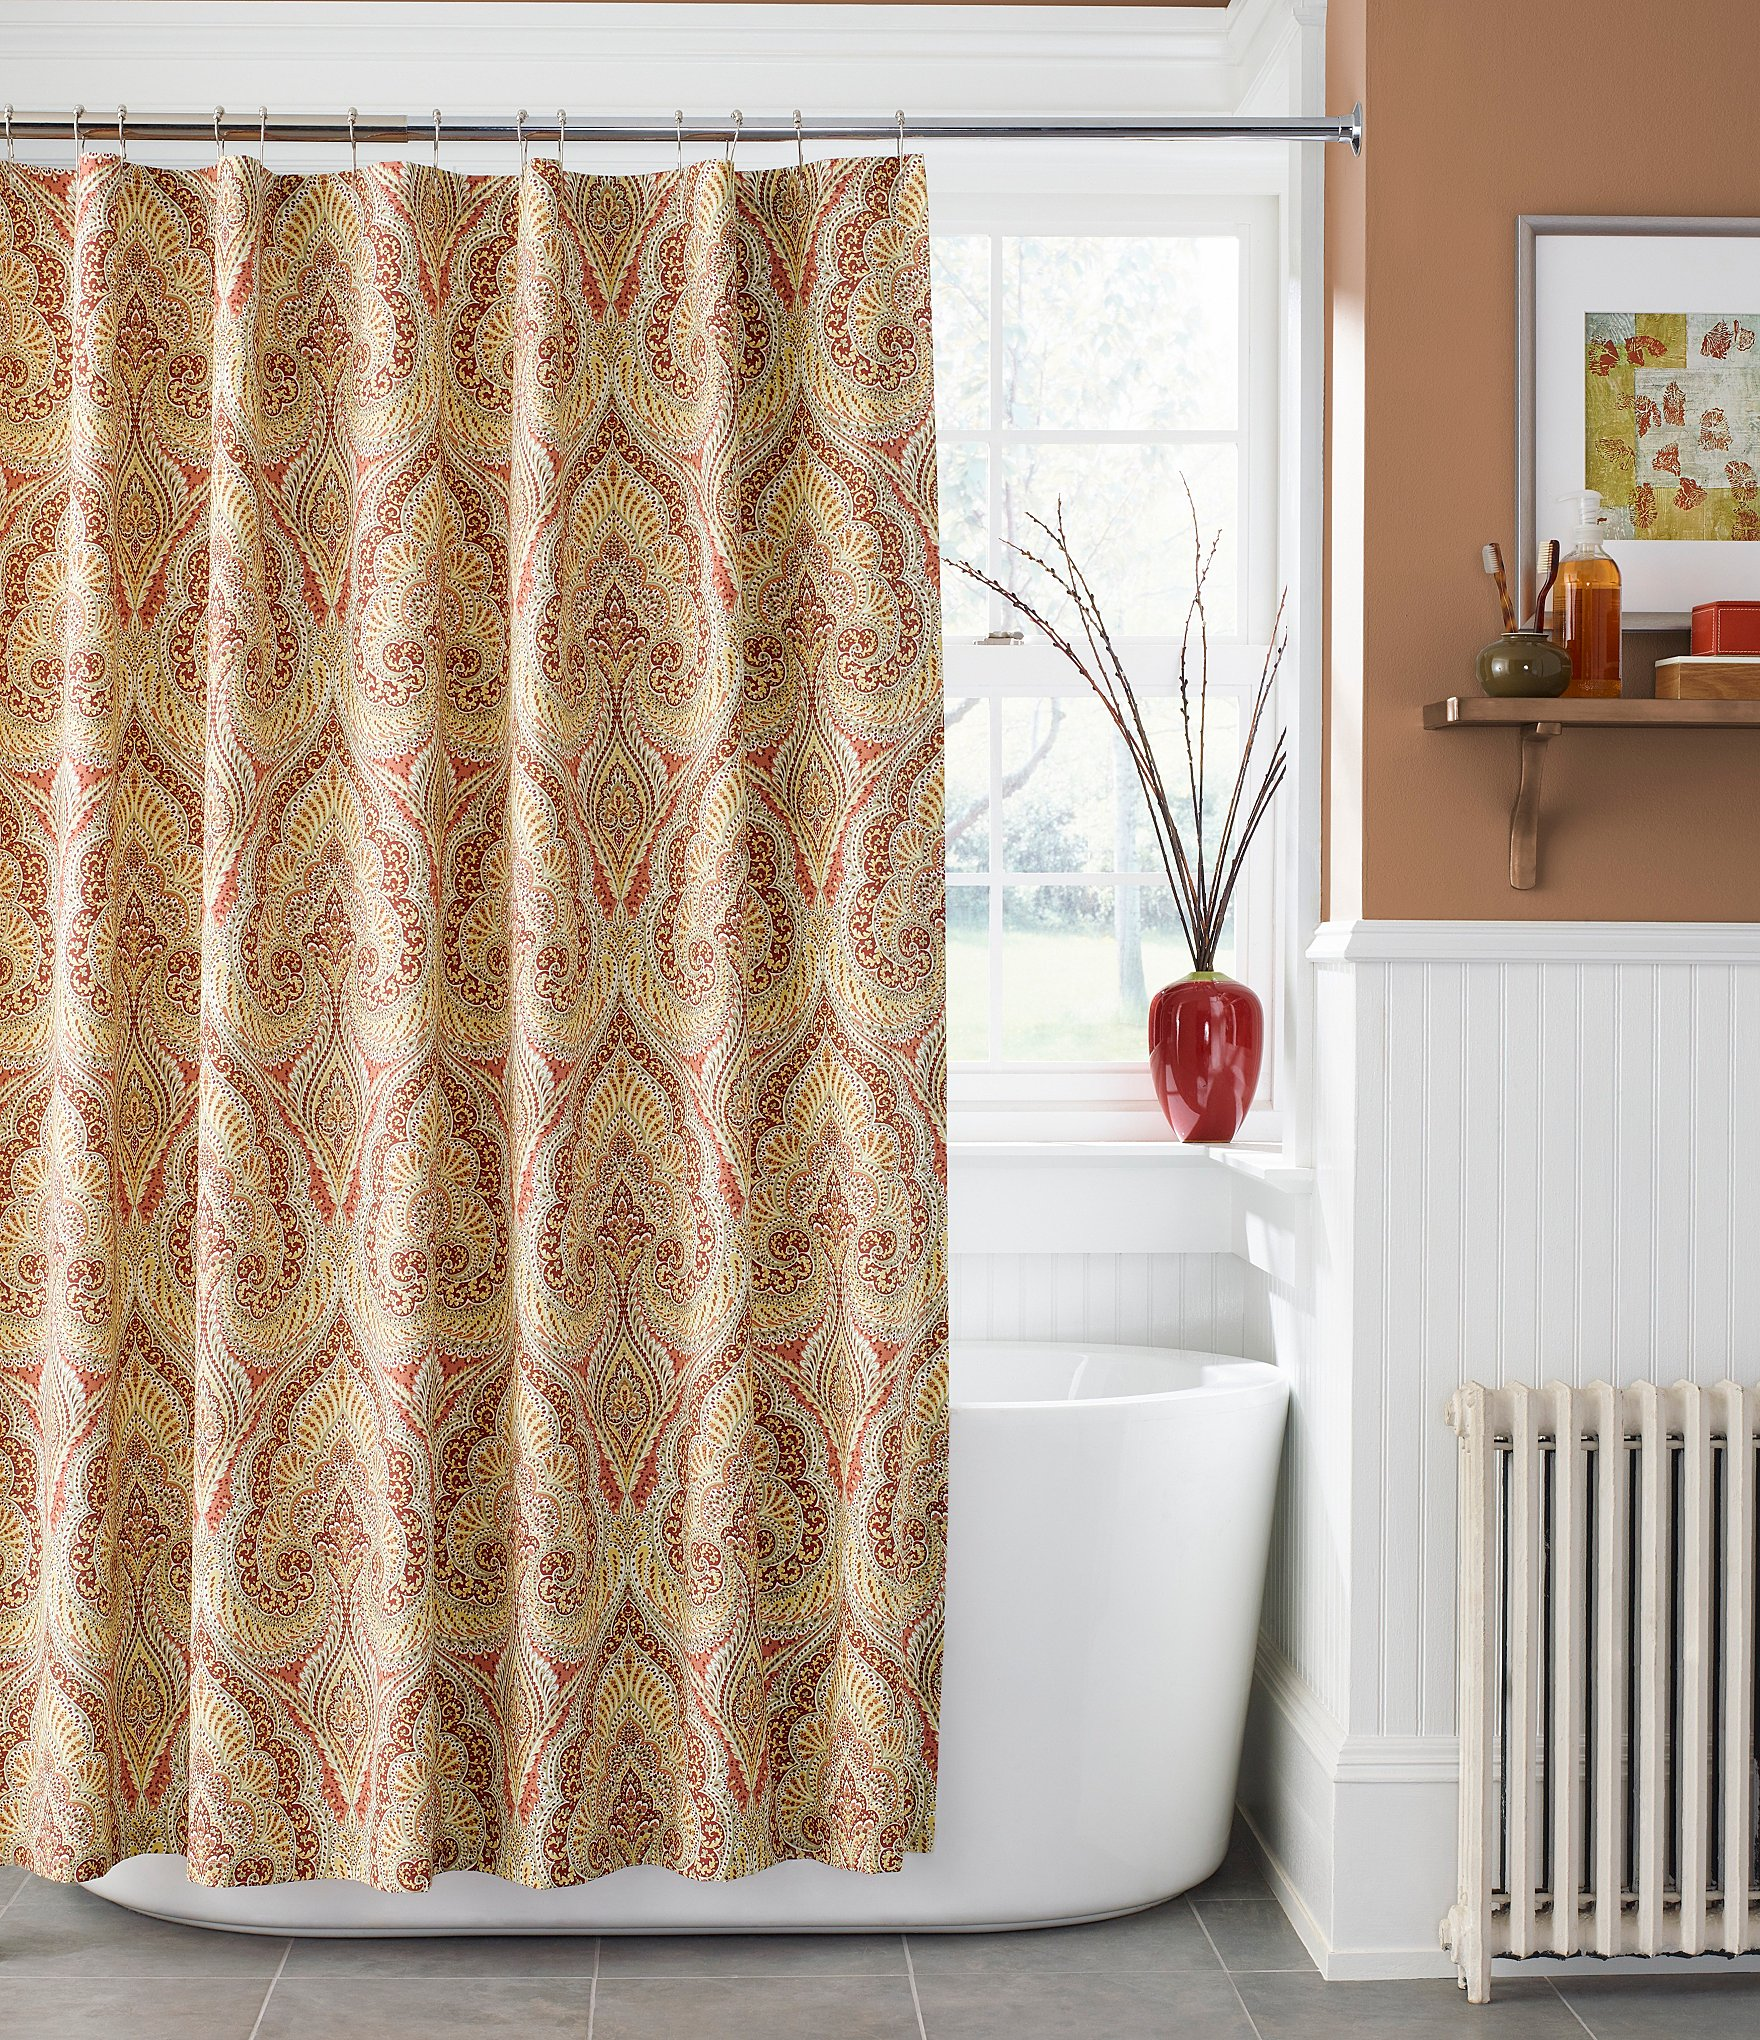 J queen new york lucca shower curtain dillards for Dillards bathroom accessories sets